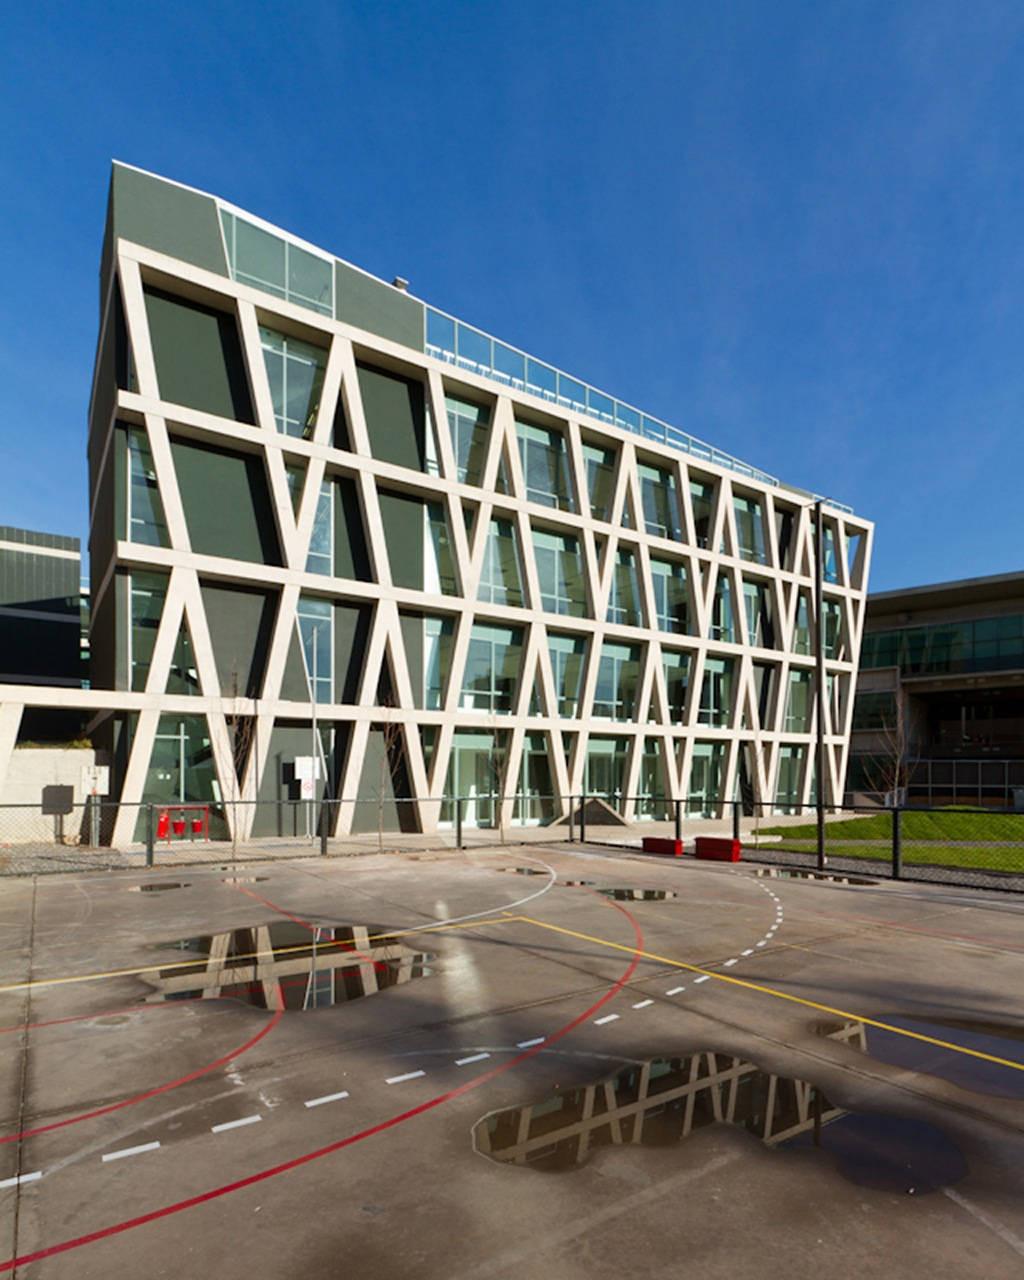 Galer a de edificio fen marsino arquitectos asociados 2 - Arquitectos madrid 2 0 ...